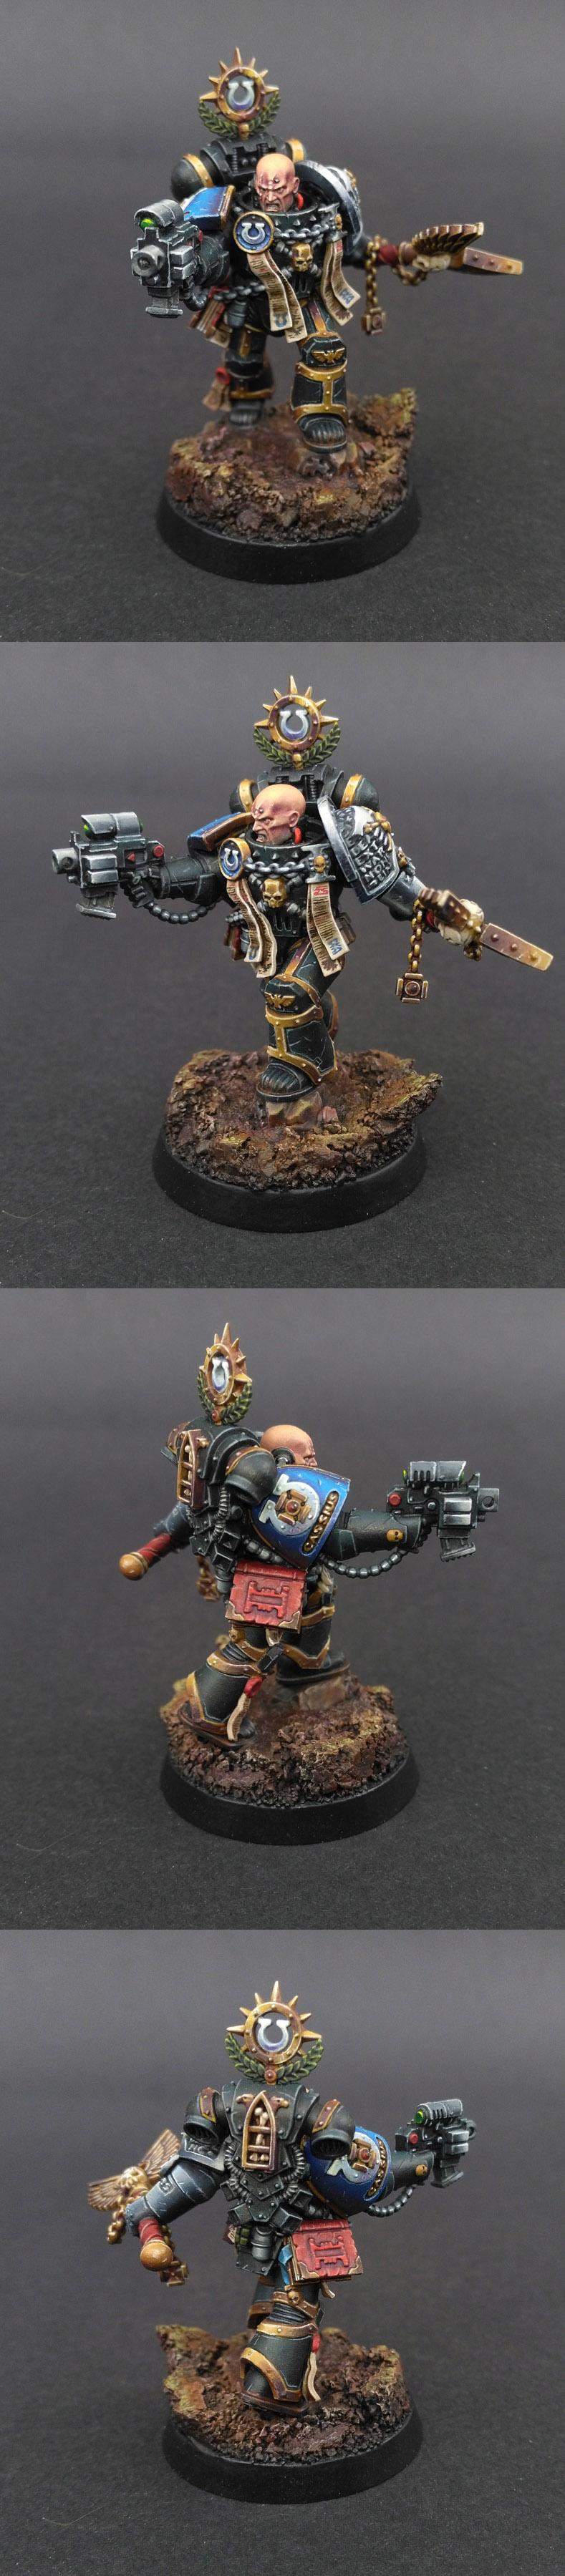 Ortan Cassius - Deathwatch Chaplain